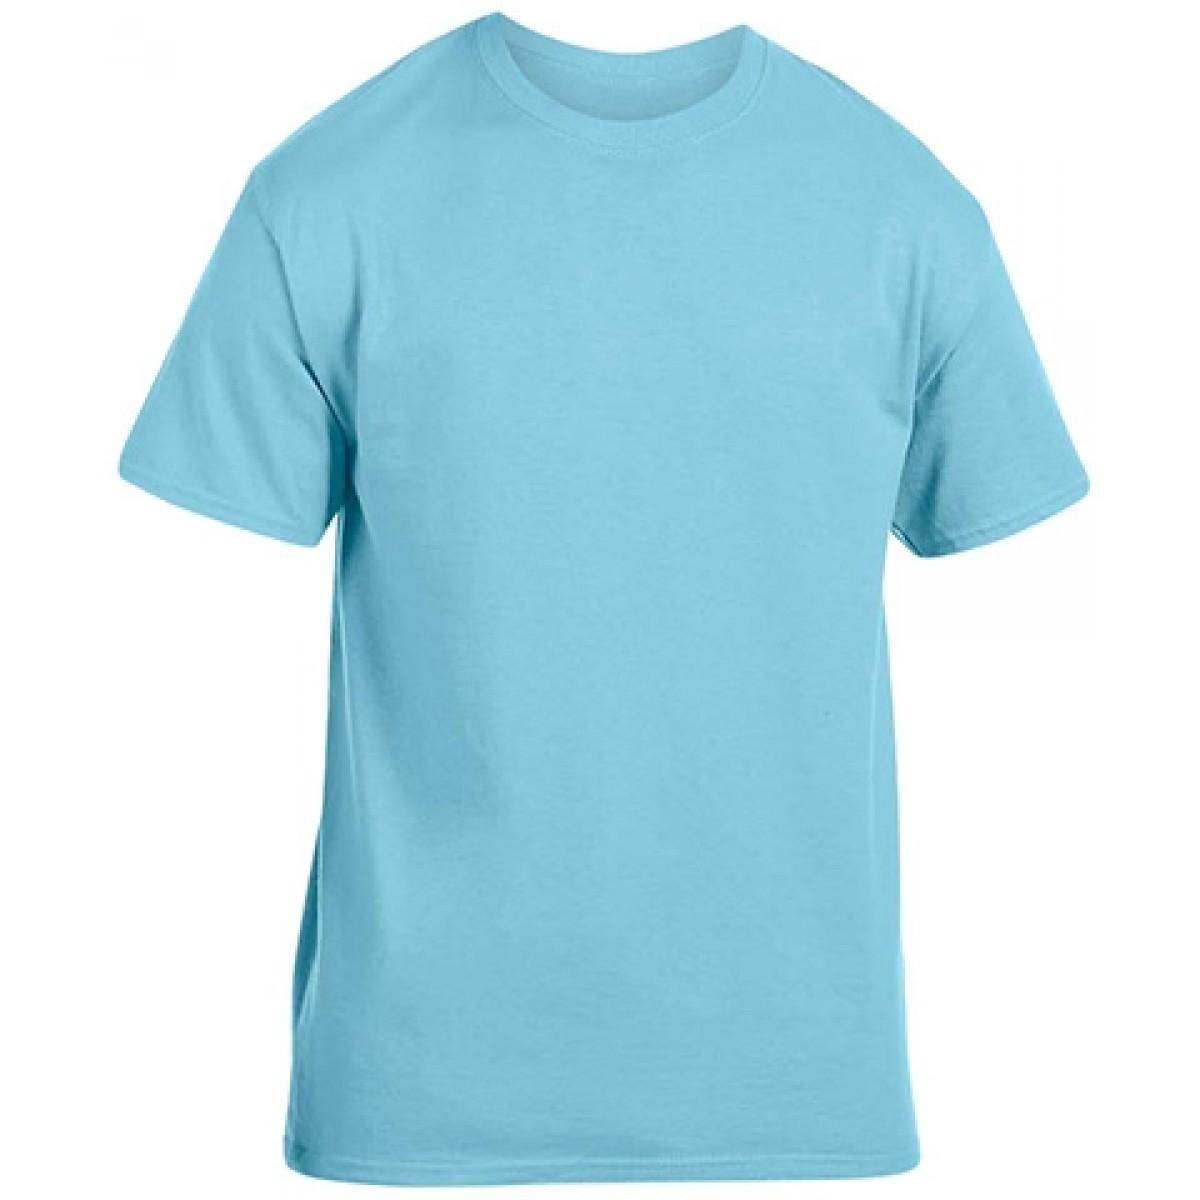 Soft 100% Cotton T-Shirt-Sky Blue-YM